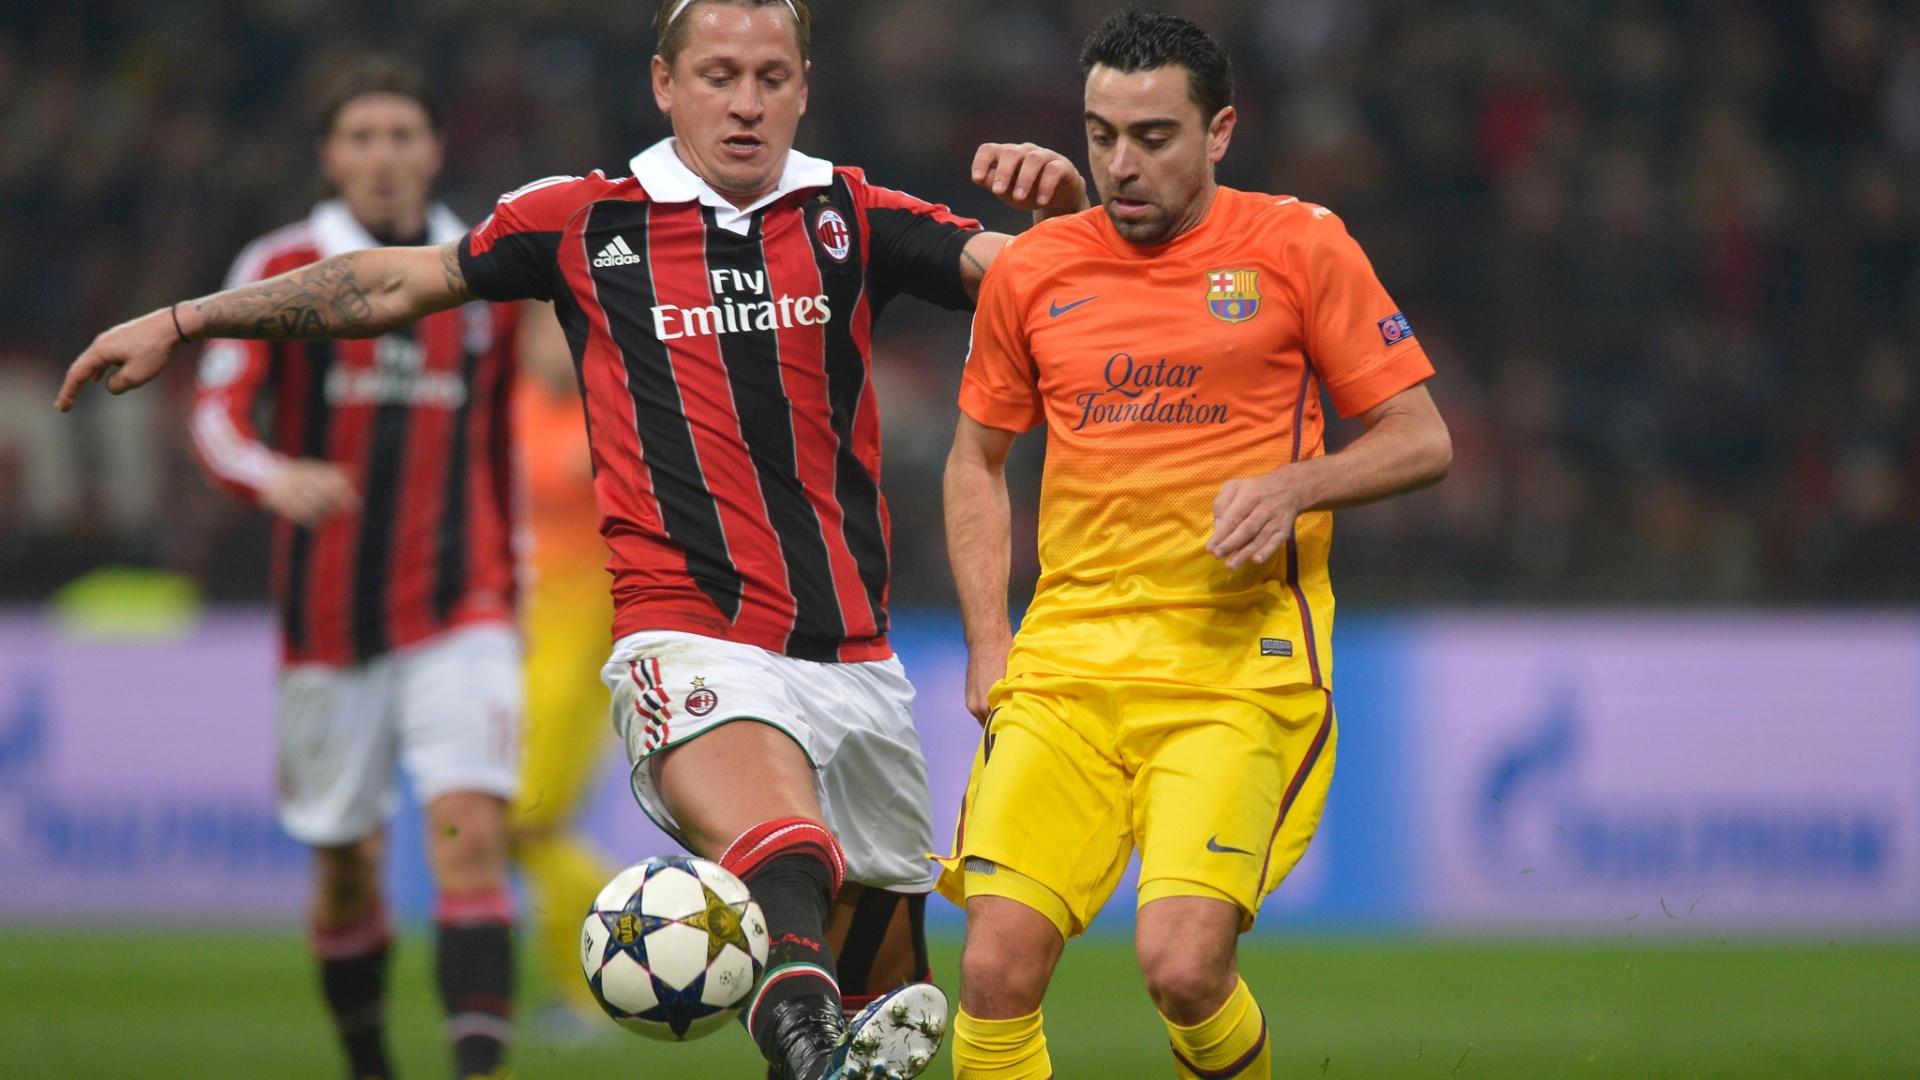 20.fev.2013 - Xavi (dir.), do Barcelona, domina a bola sob pressão de Mexes, do Milan (esq.)